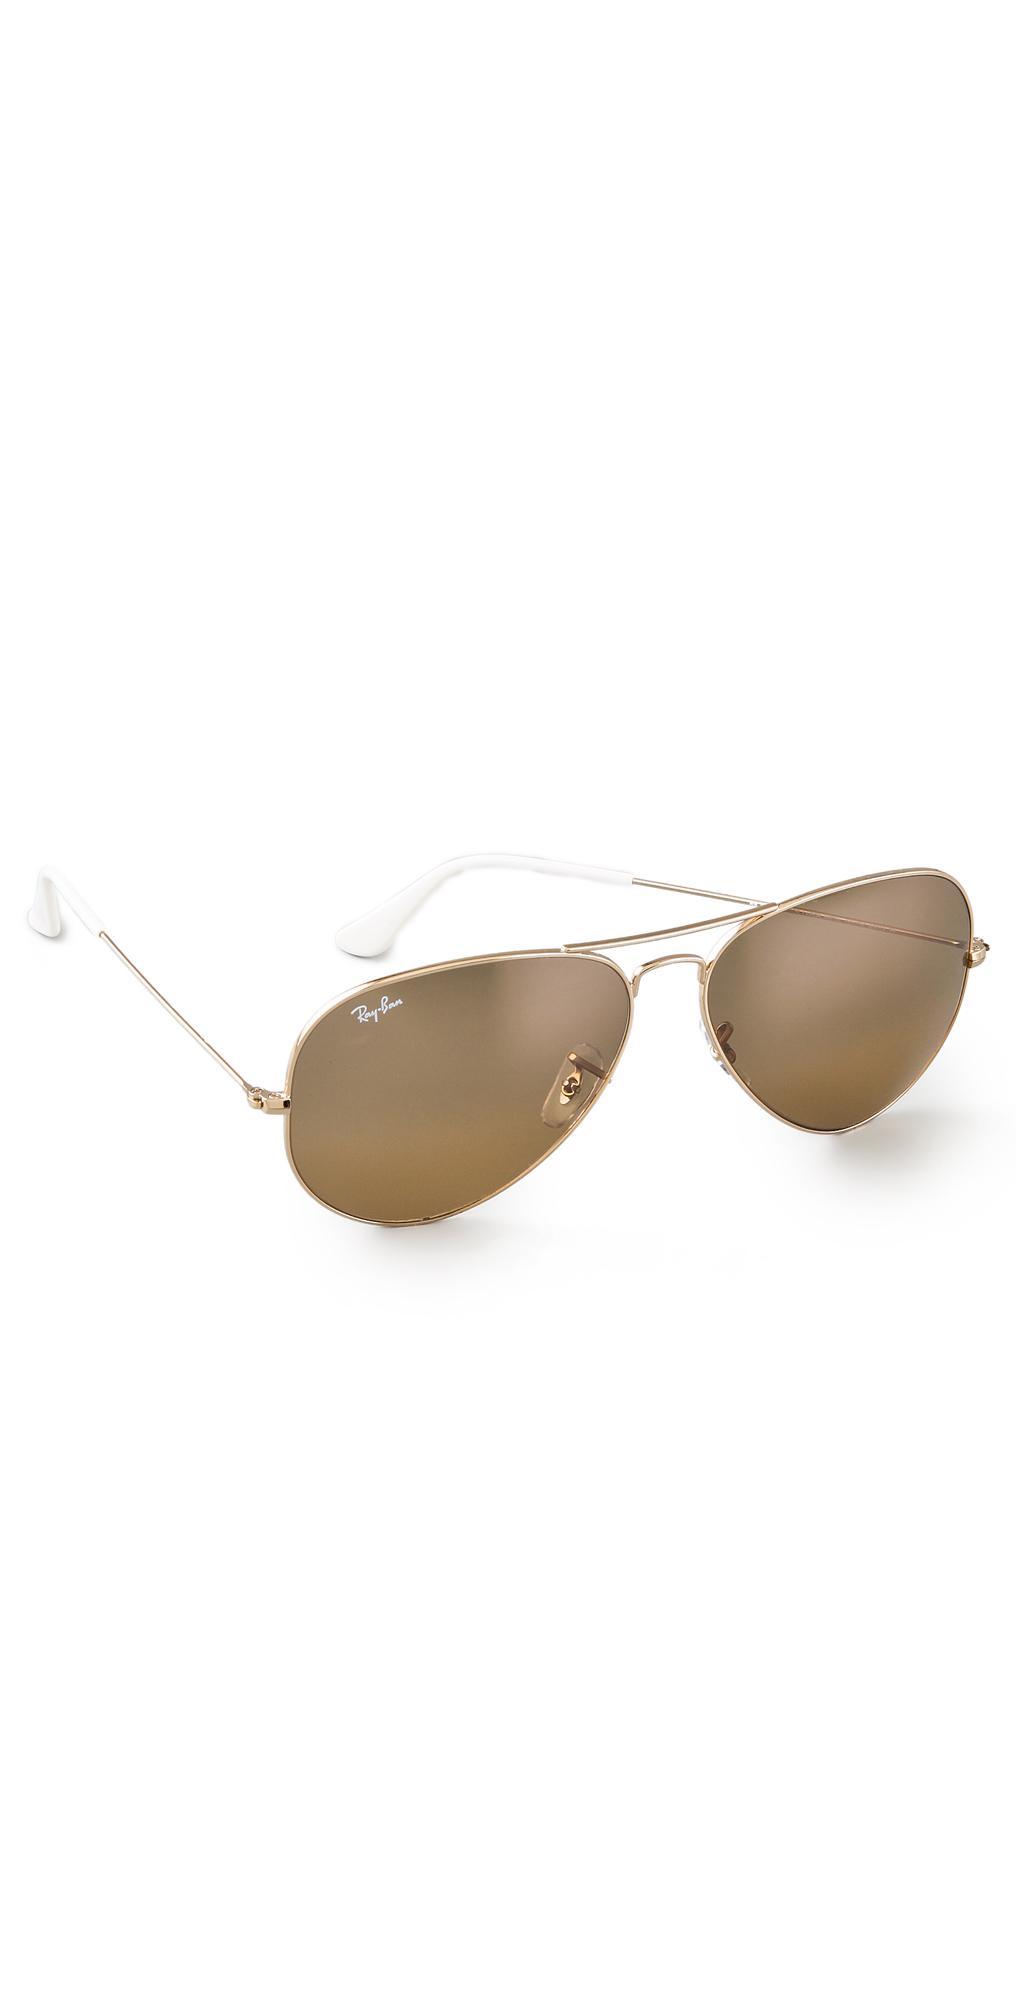 5860fc416b ... wholesale ray ban oversized original aviator sunglasses shopbop 86eb7  20714